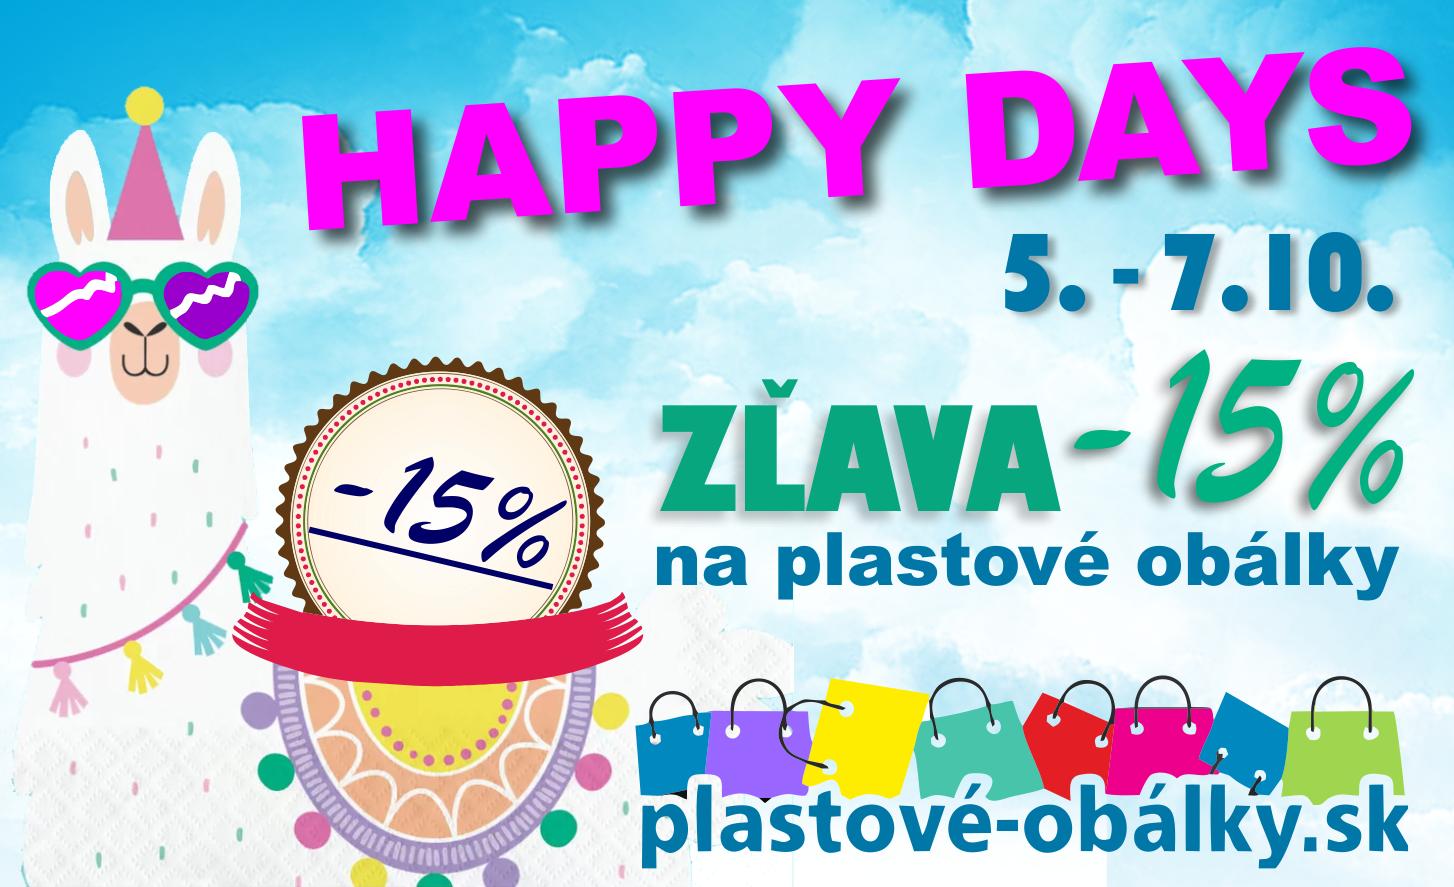 HAPPY DAYS Plastové obálky -15% AKCIA